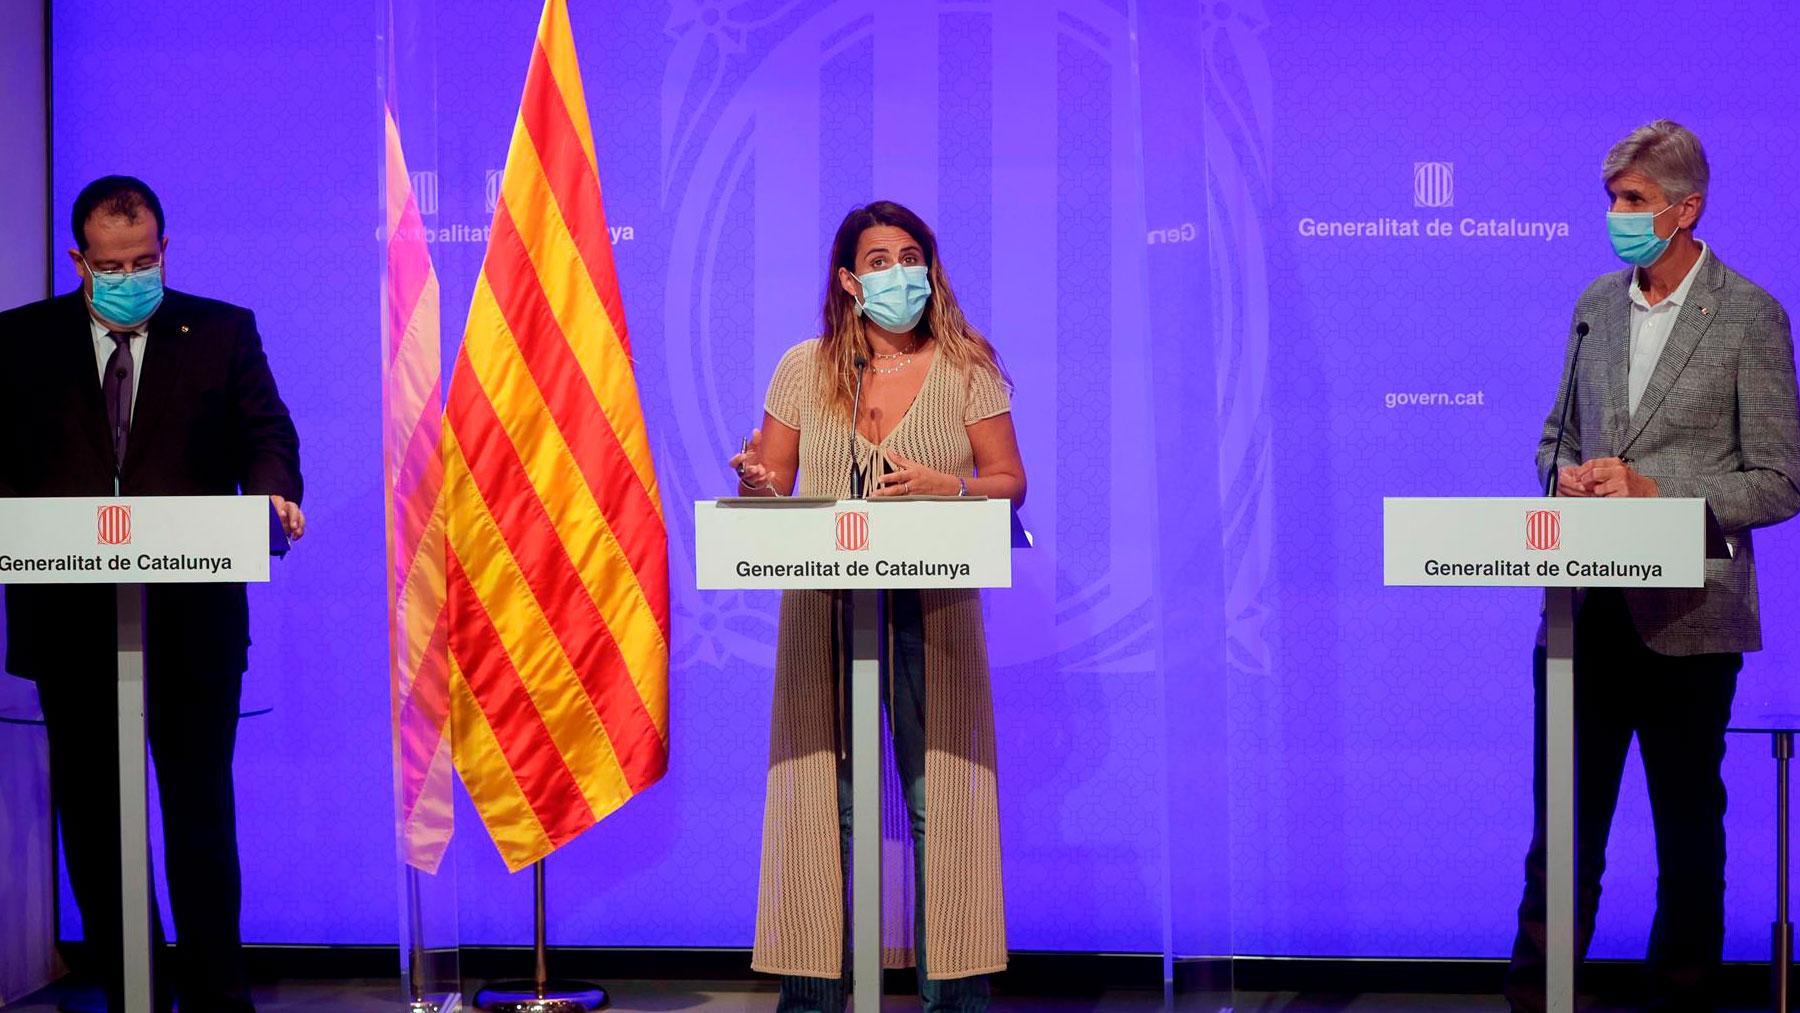 El conseller de Sanidad de la Generalitat de Cataluña, Josep Maria Argimón (d), junto al de Interior, Joan Ignasi Elena (i), y la portavoz del Govern, Patrícia Plaja. Foto: EFE